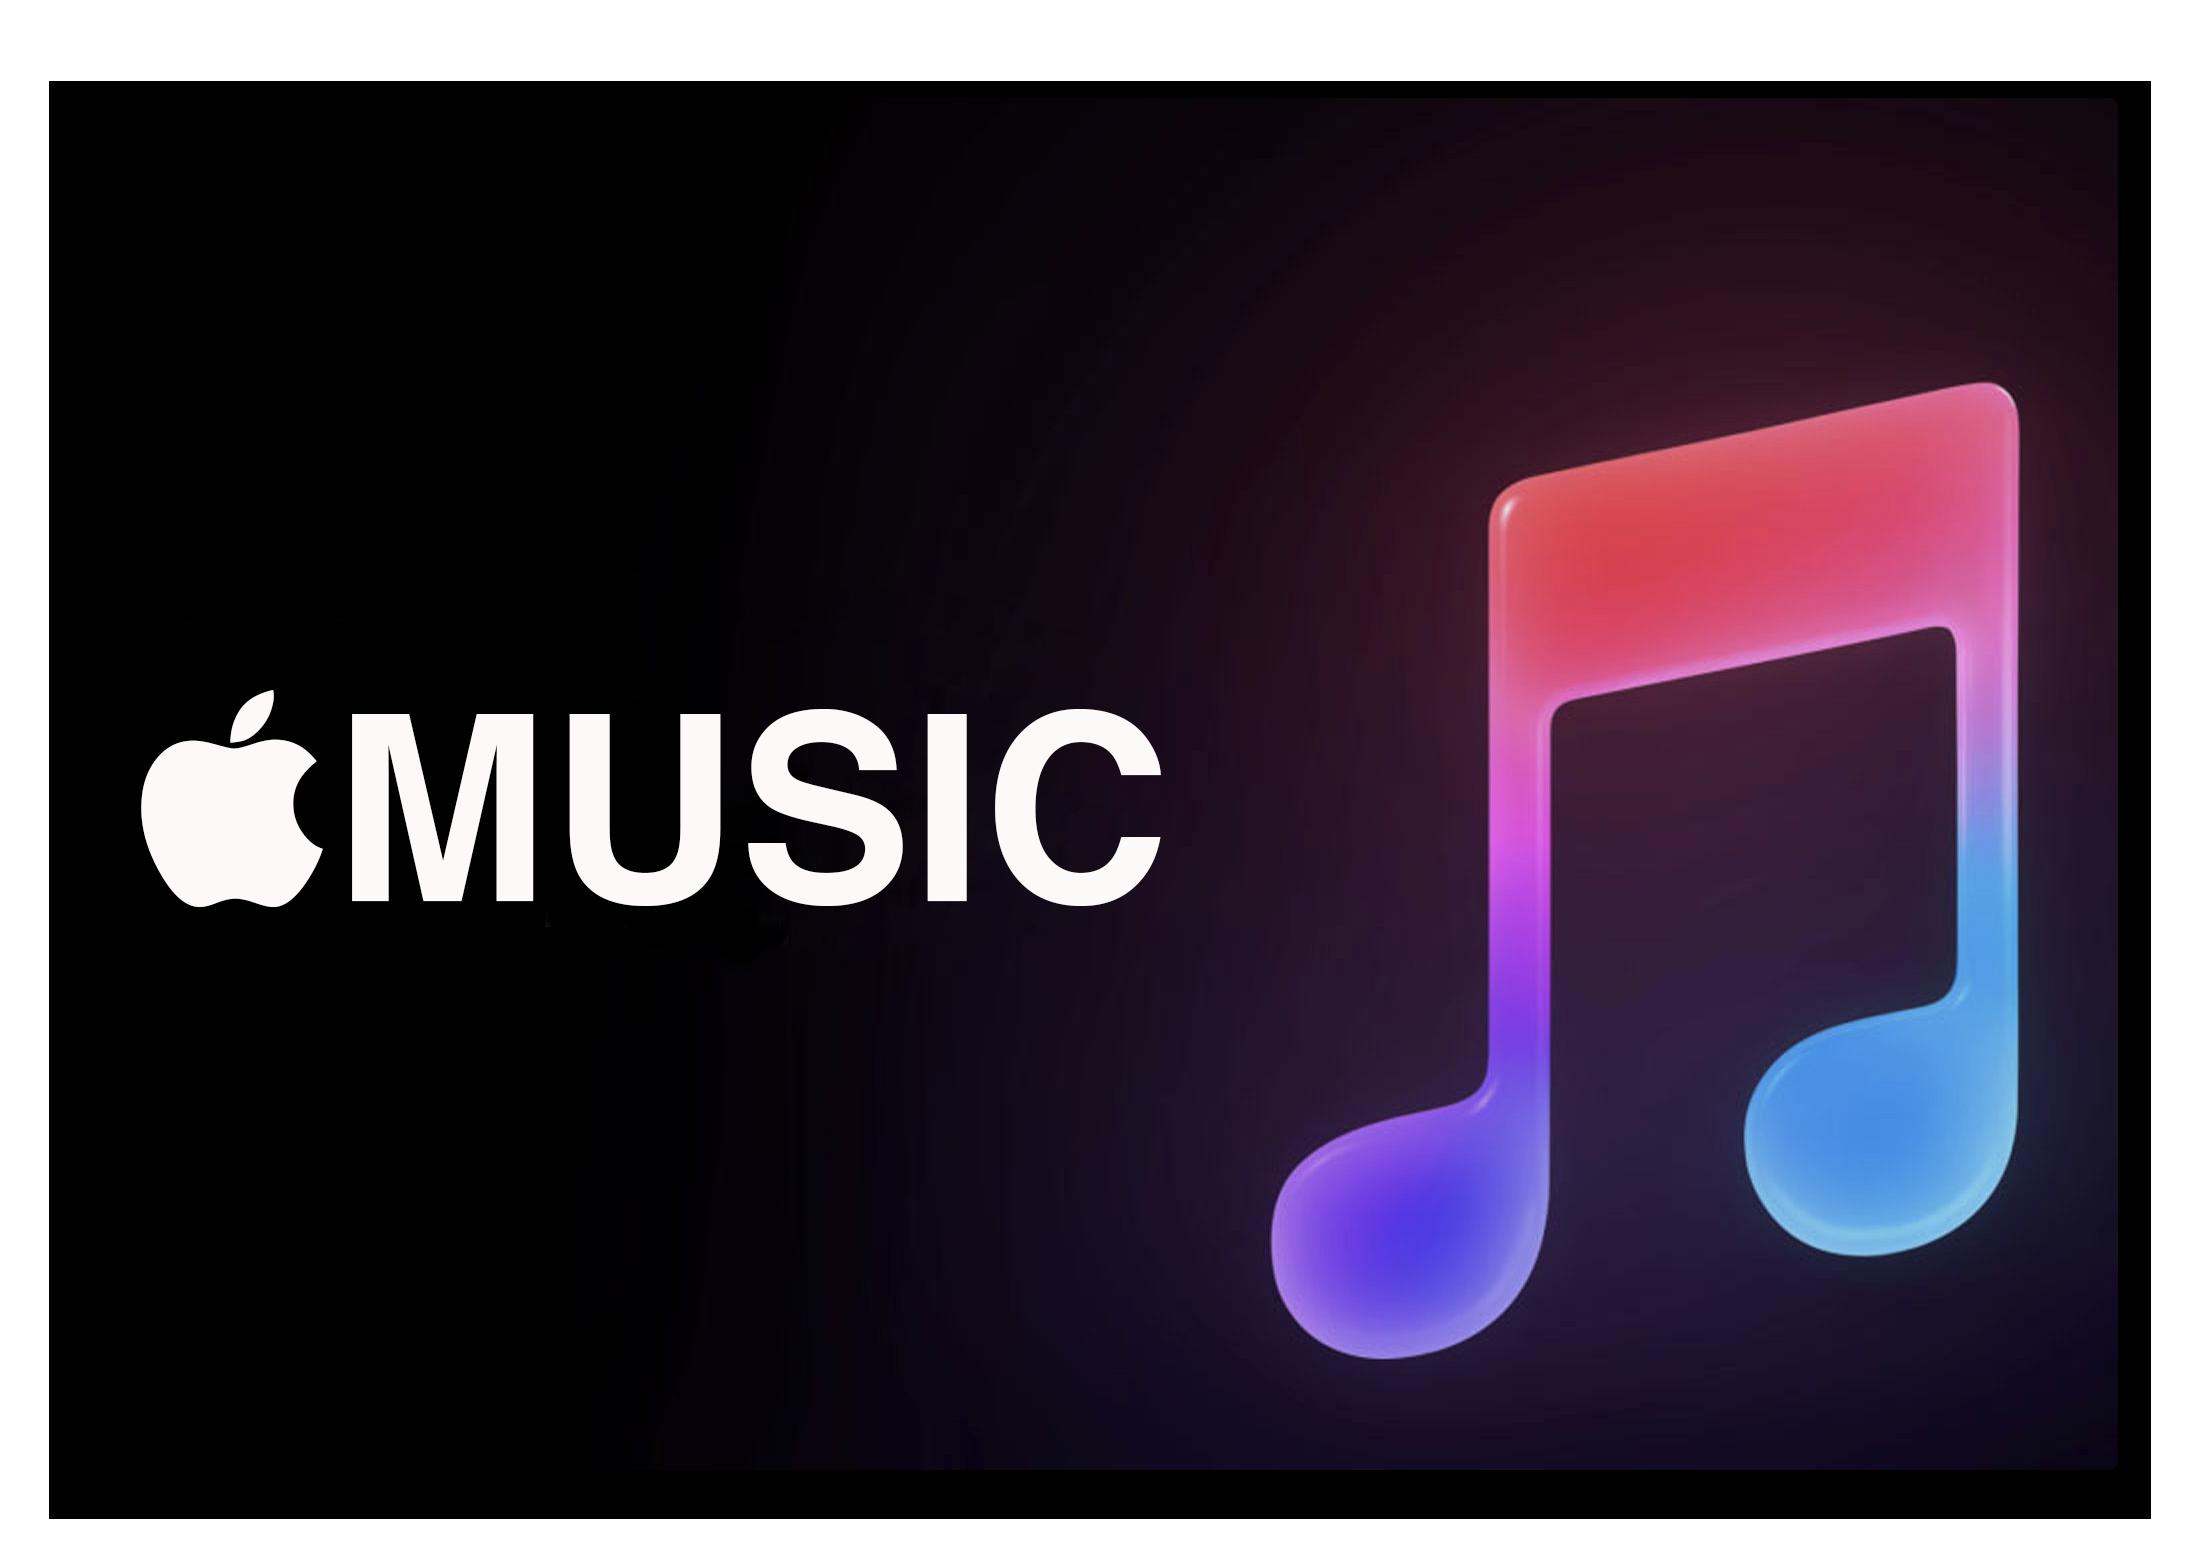 Apple MusicがAmazon Fire TVで利用可能に、Amazon EchoのApple Musicが他の国にも広がる